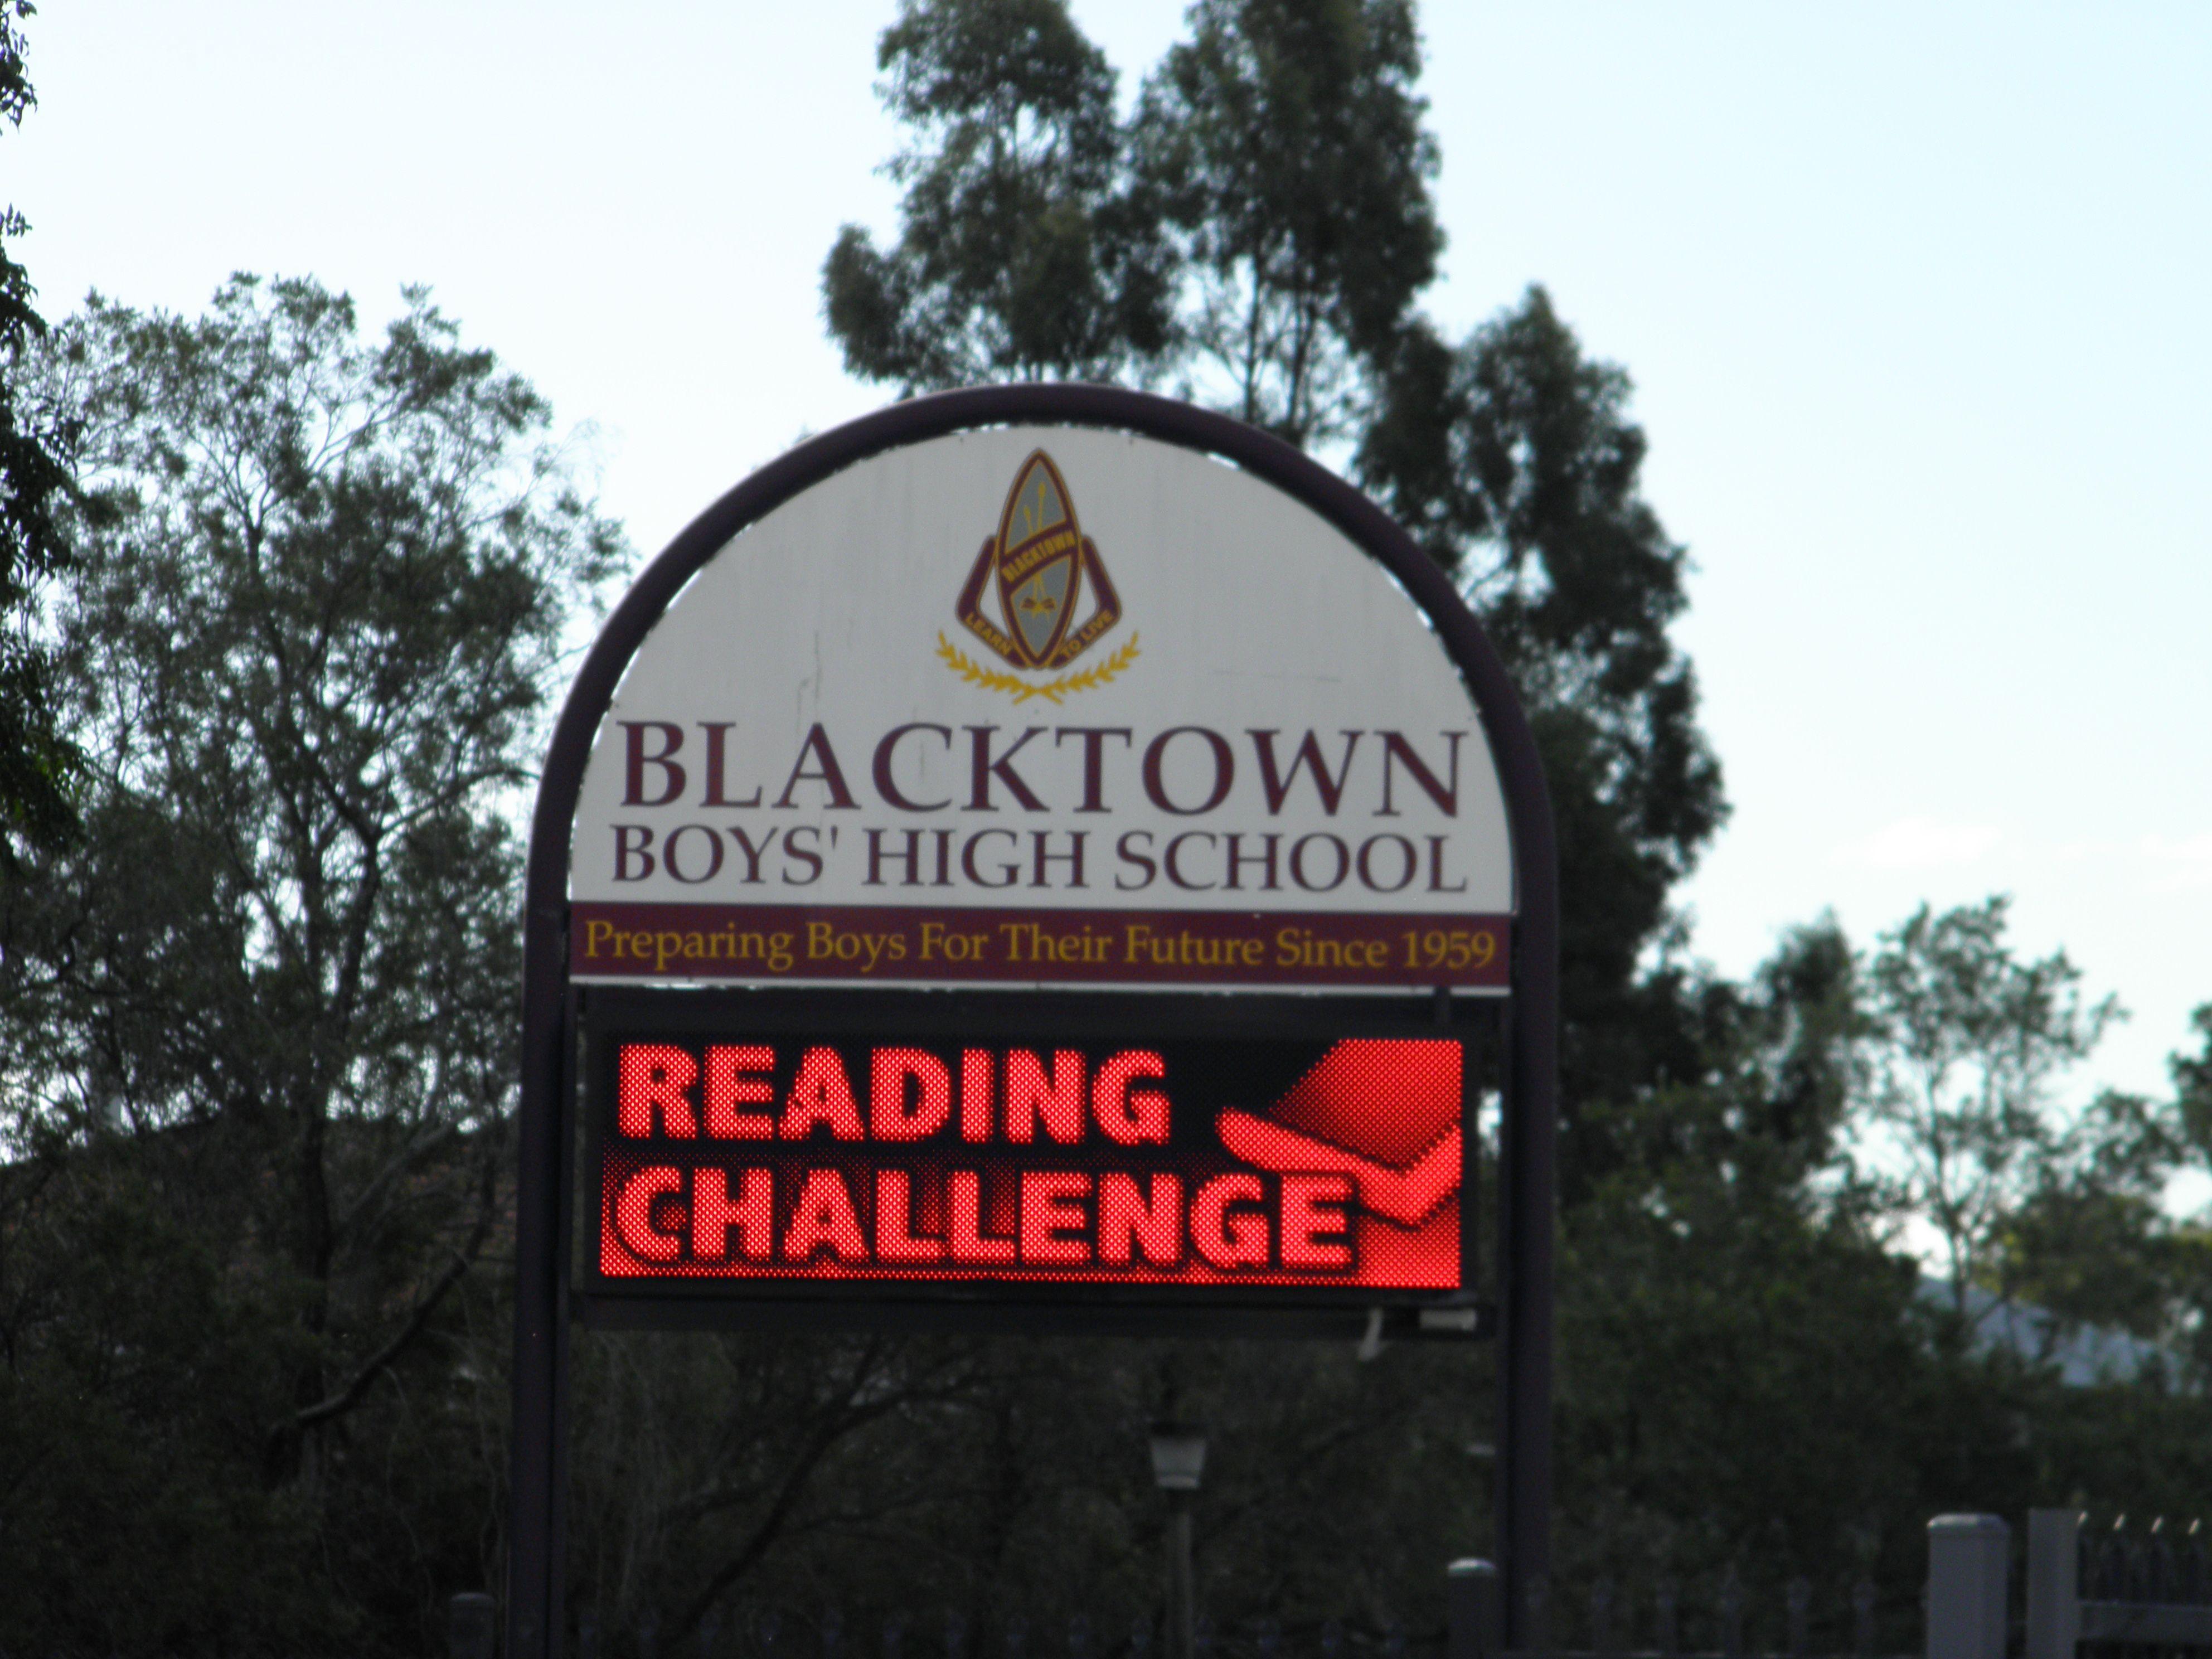 Blacktown Boys High School Led Sign School Signs Csi Corporatesignindustries Signage Graphic Design Identity Si Corporate Signs School Signs Led Signs